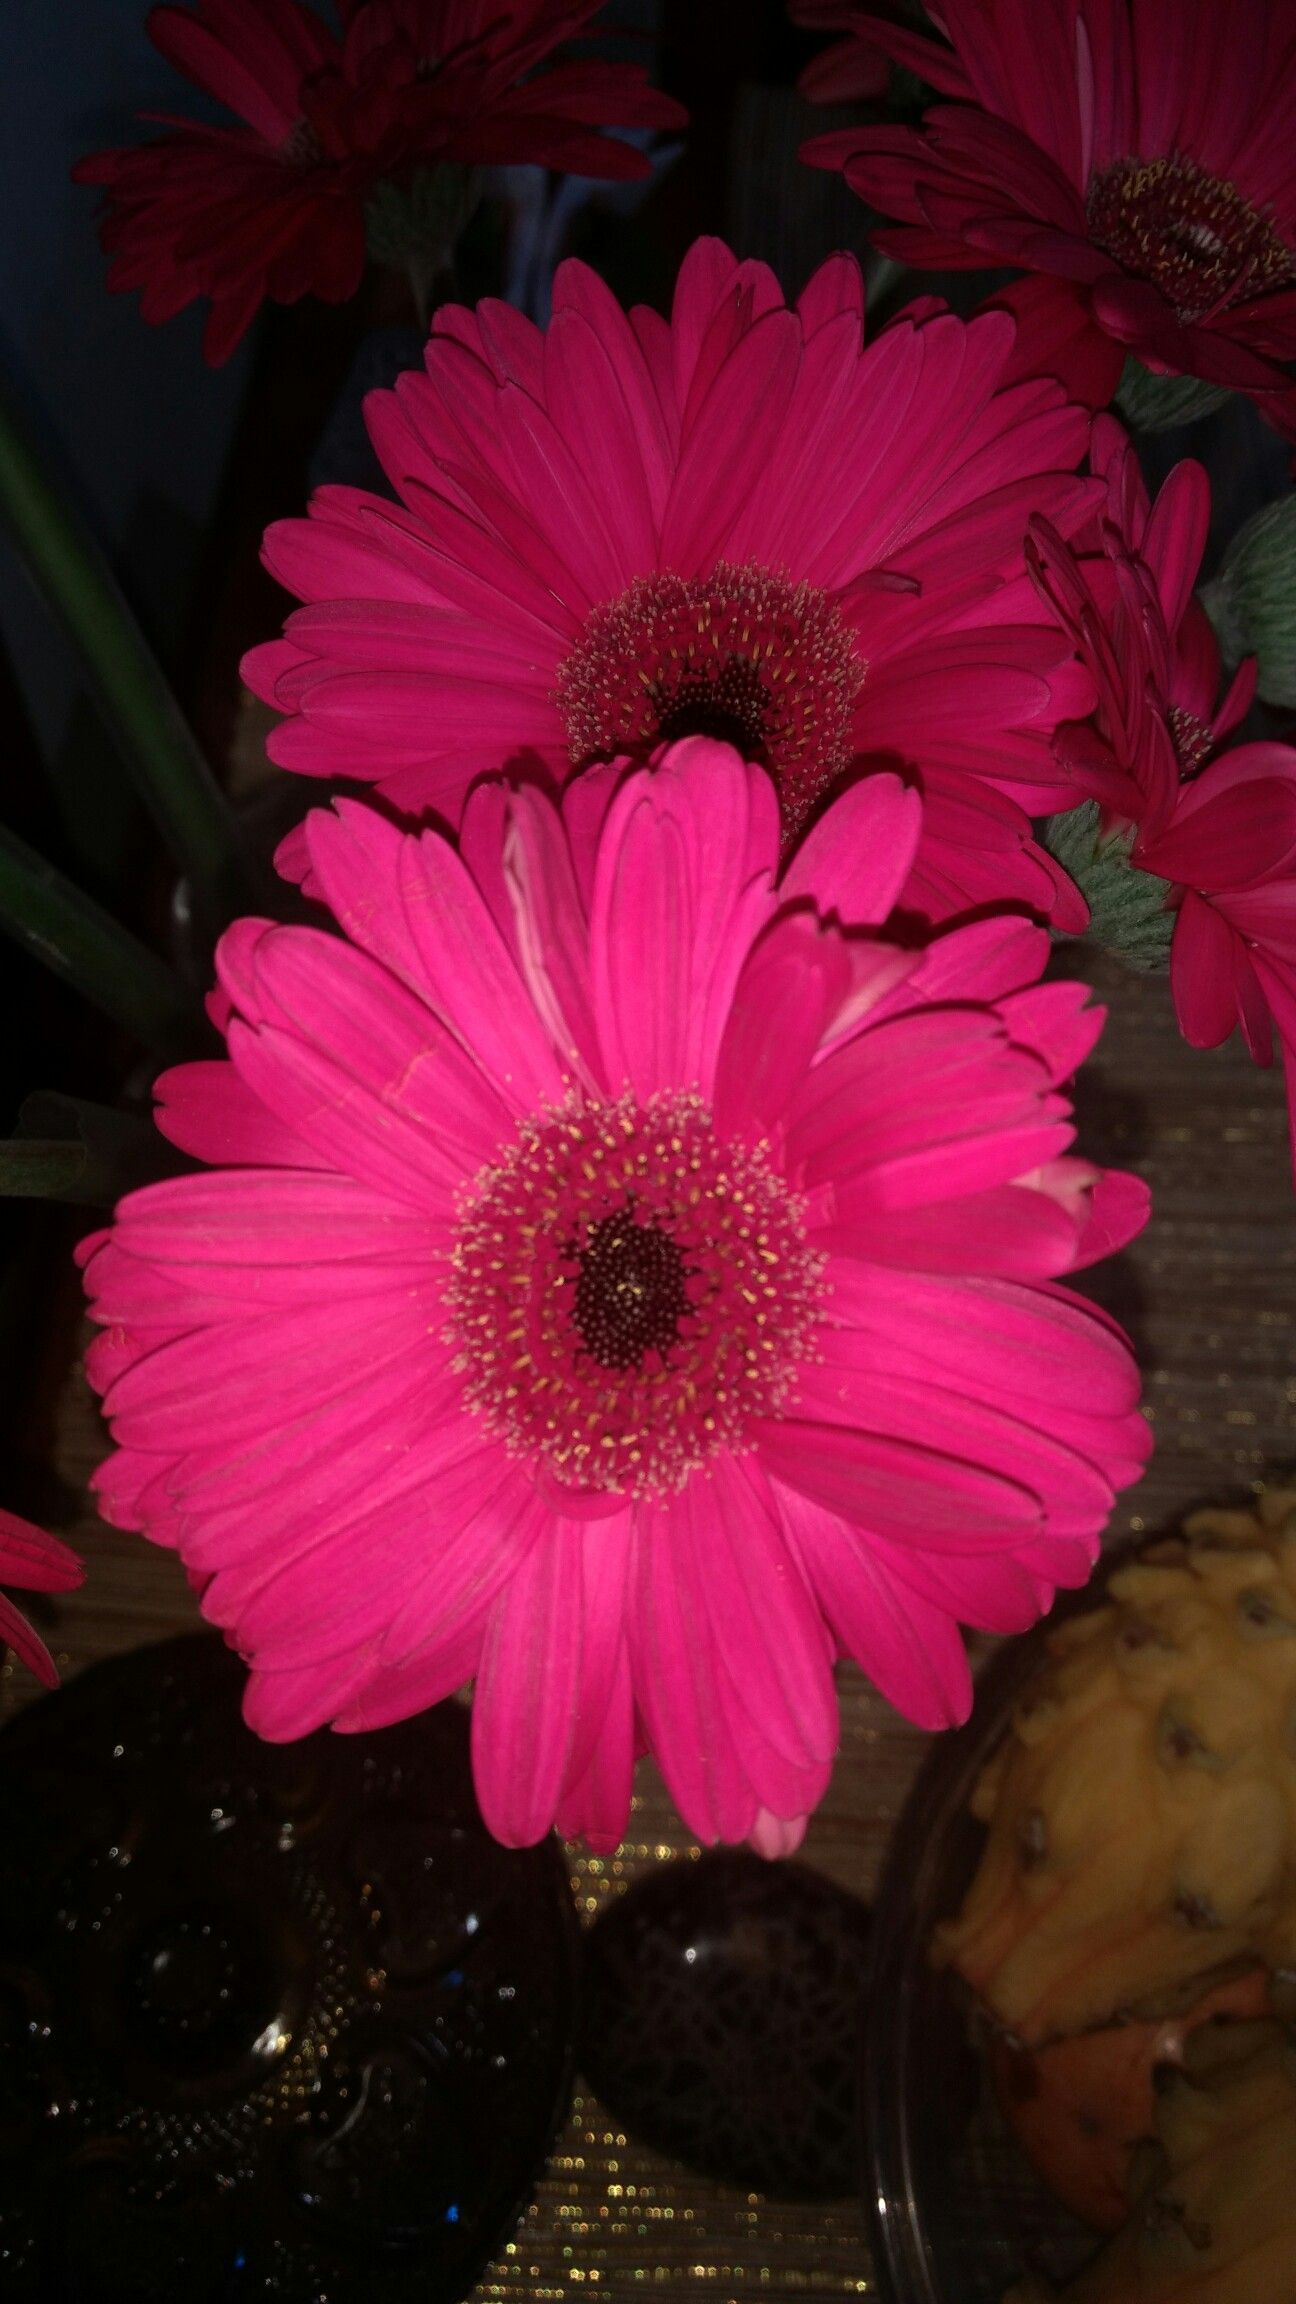 Love flower power daisy graffiti print cotton fabric 60s 70s retro - Digital Download Instant Printable Vintage Photo Black White Historical Photo Instant Download Flower Powerdream